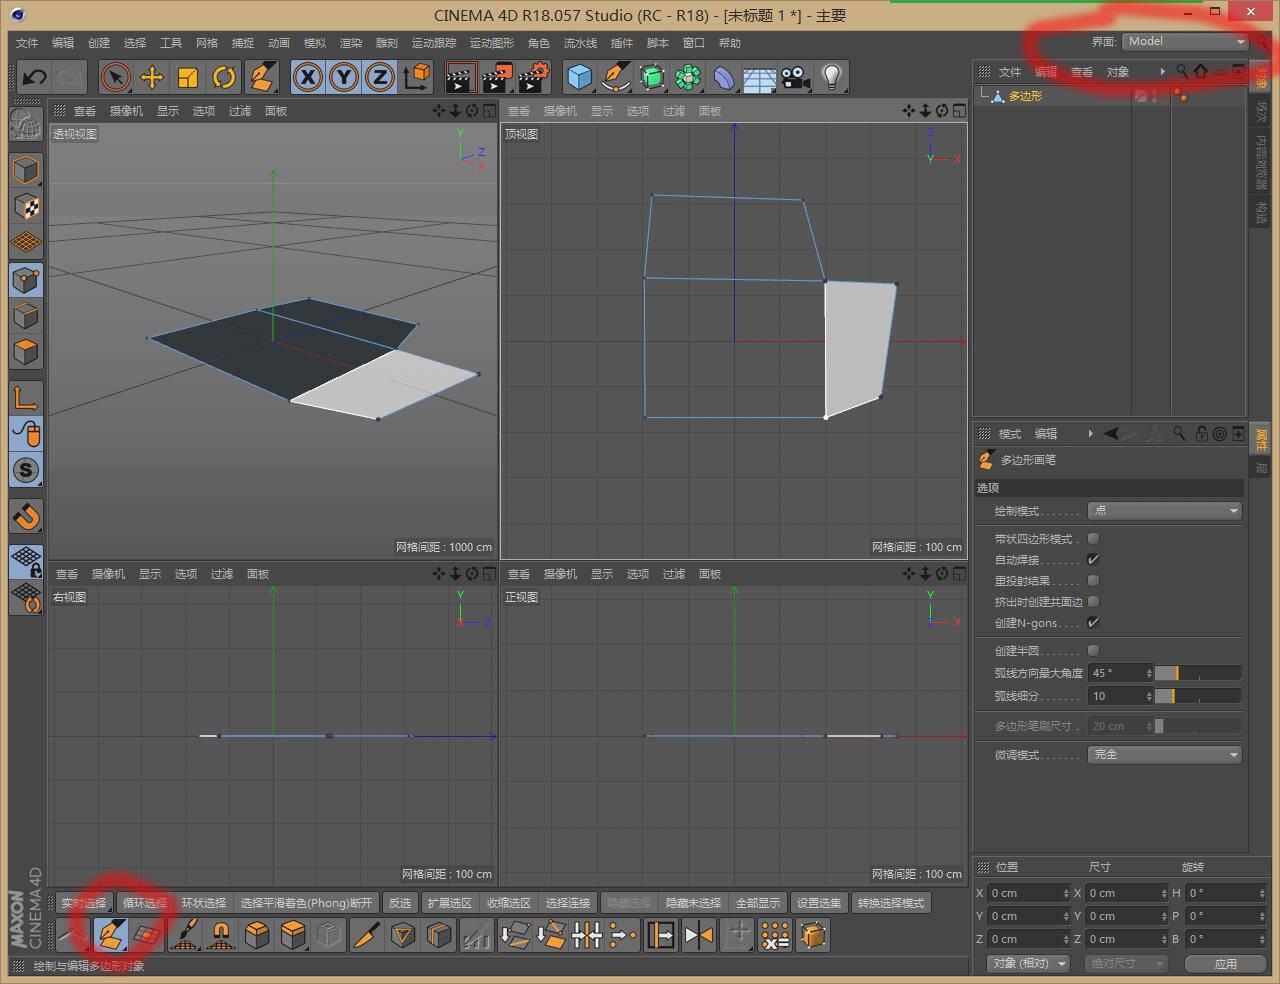 CINEMA 4D入门 (34):C4D基础 硬表面建模之Points – Edges – Ploygons(点、线、面) 的基础 - 2  三边形&四边形 - R站|学习使我快乐! - 1